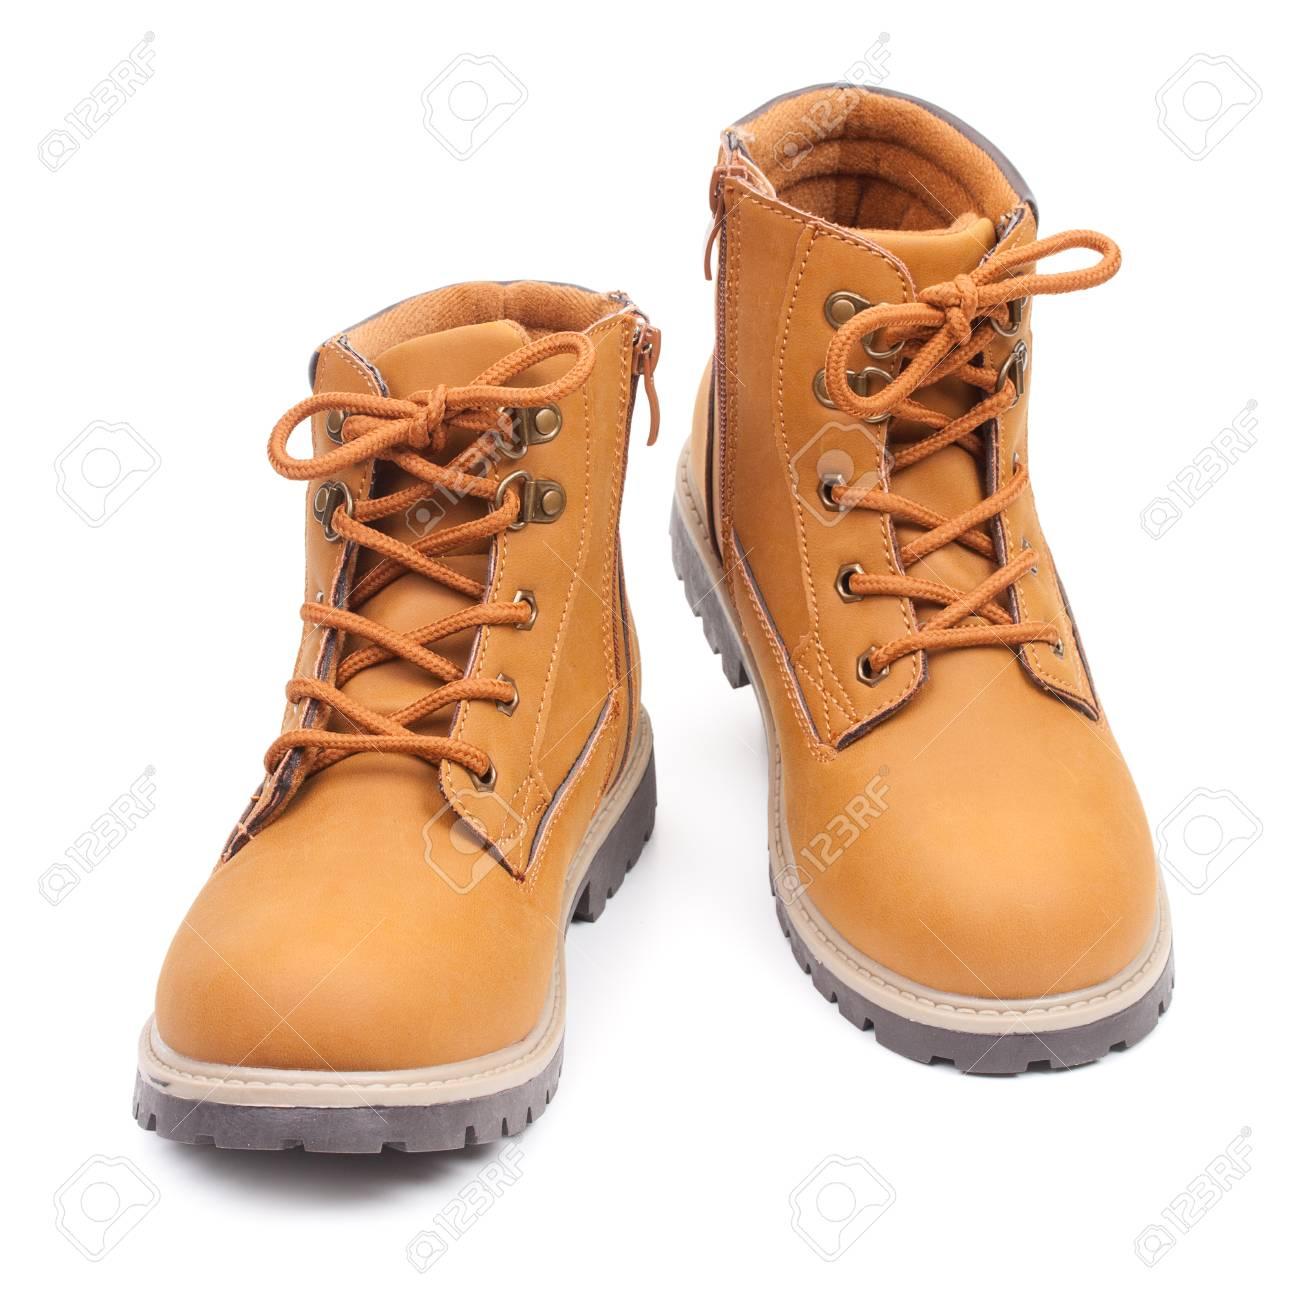 Stylish childrens boots foto